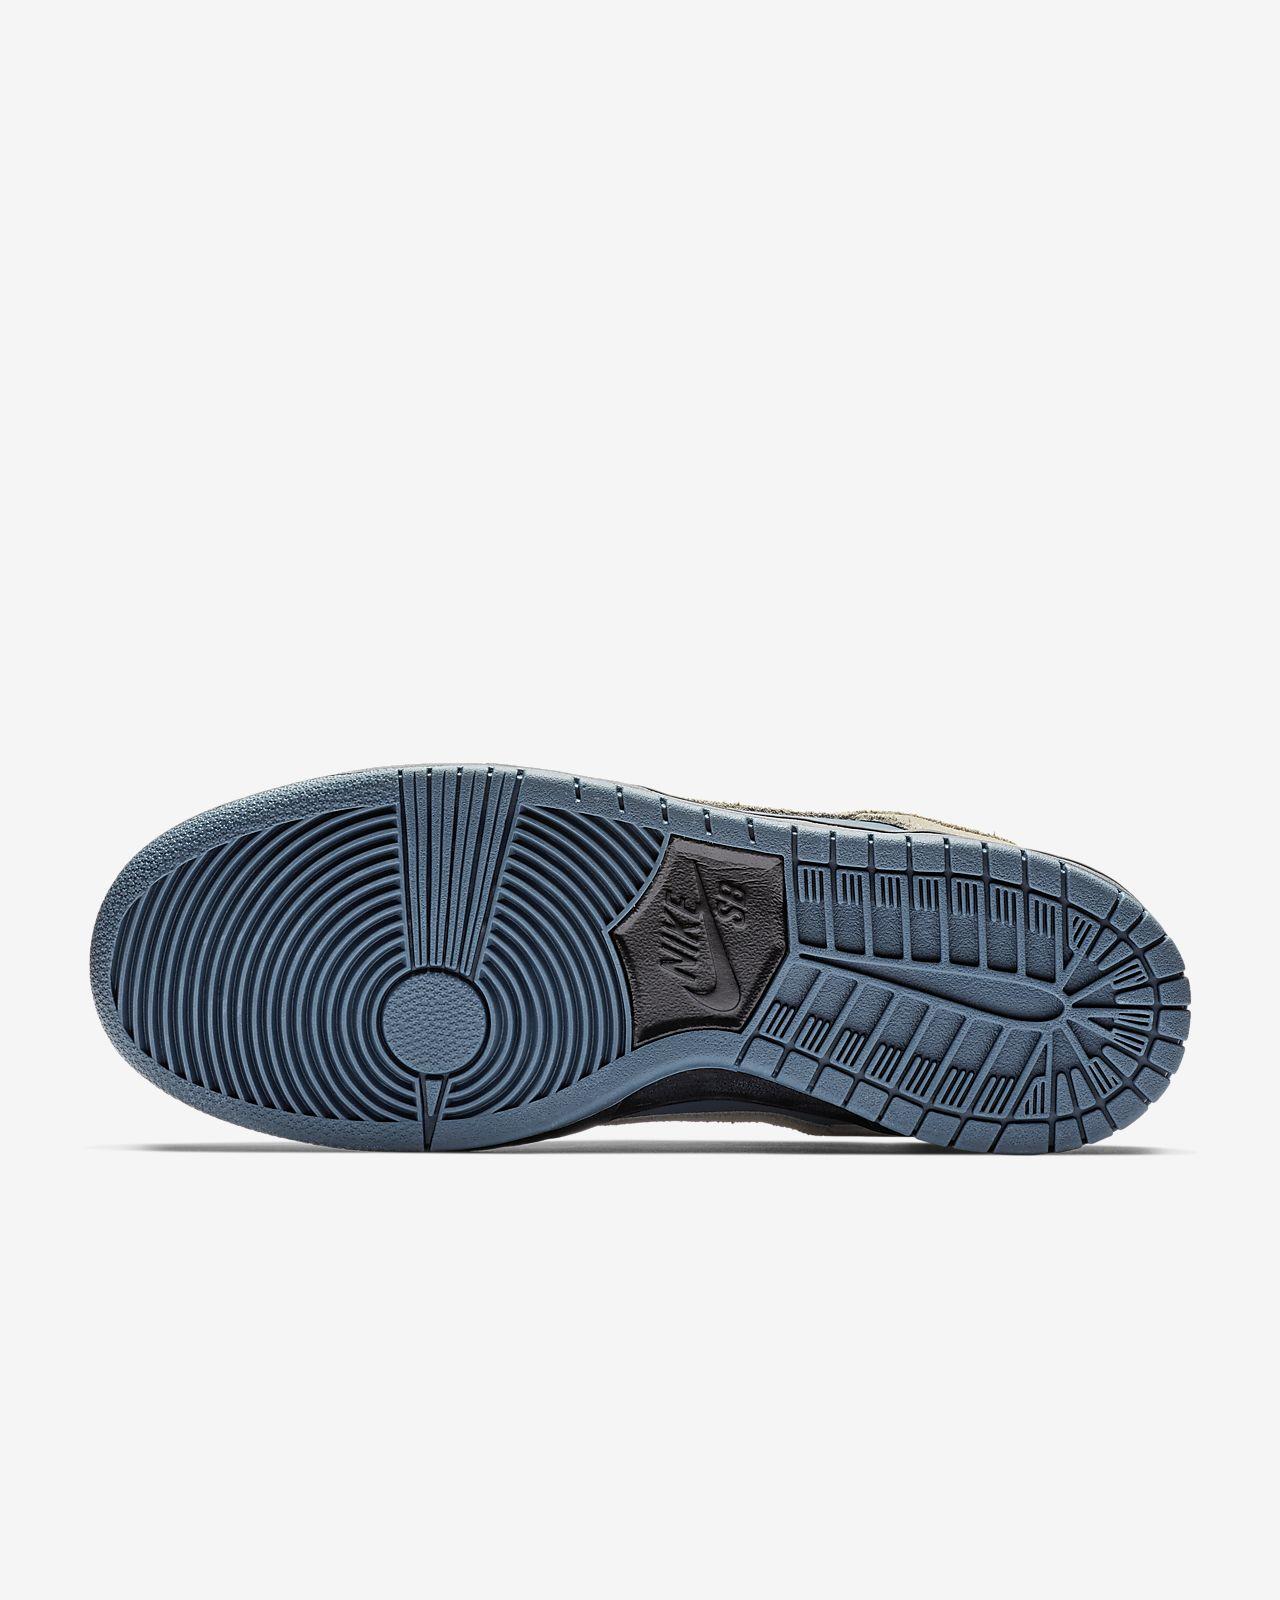 new concept 0ade3 e95ac ... Nike SB Dunk Low Pro Skateboardschuh